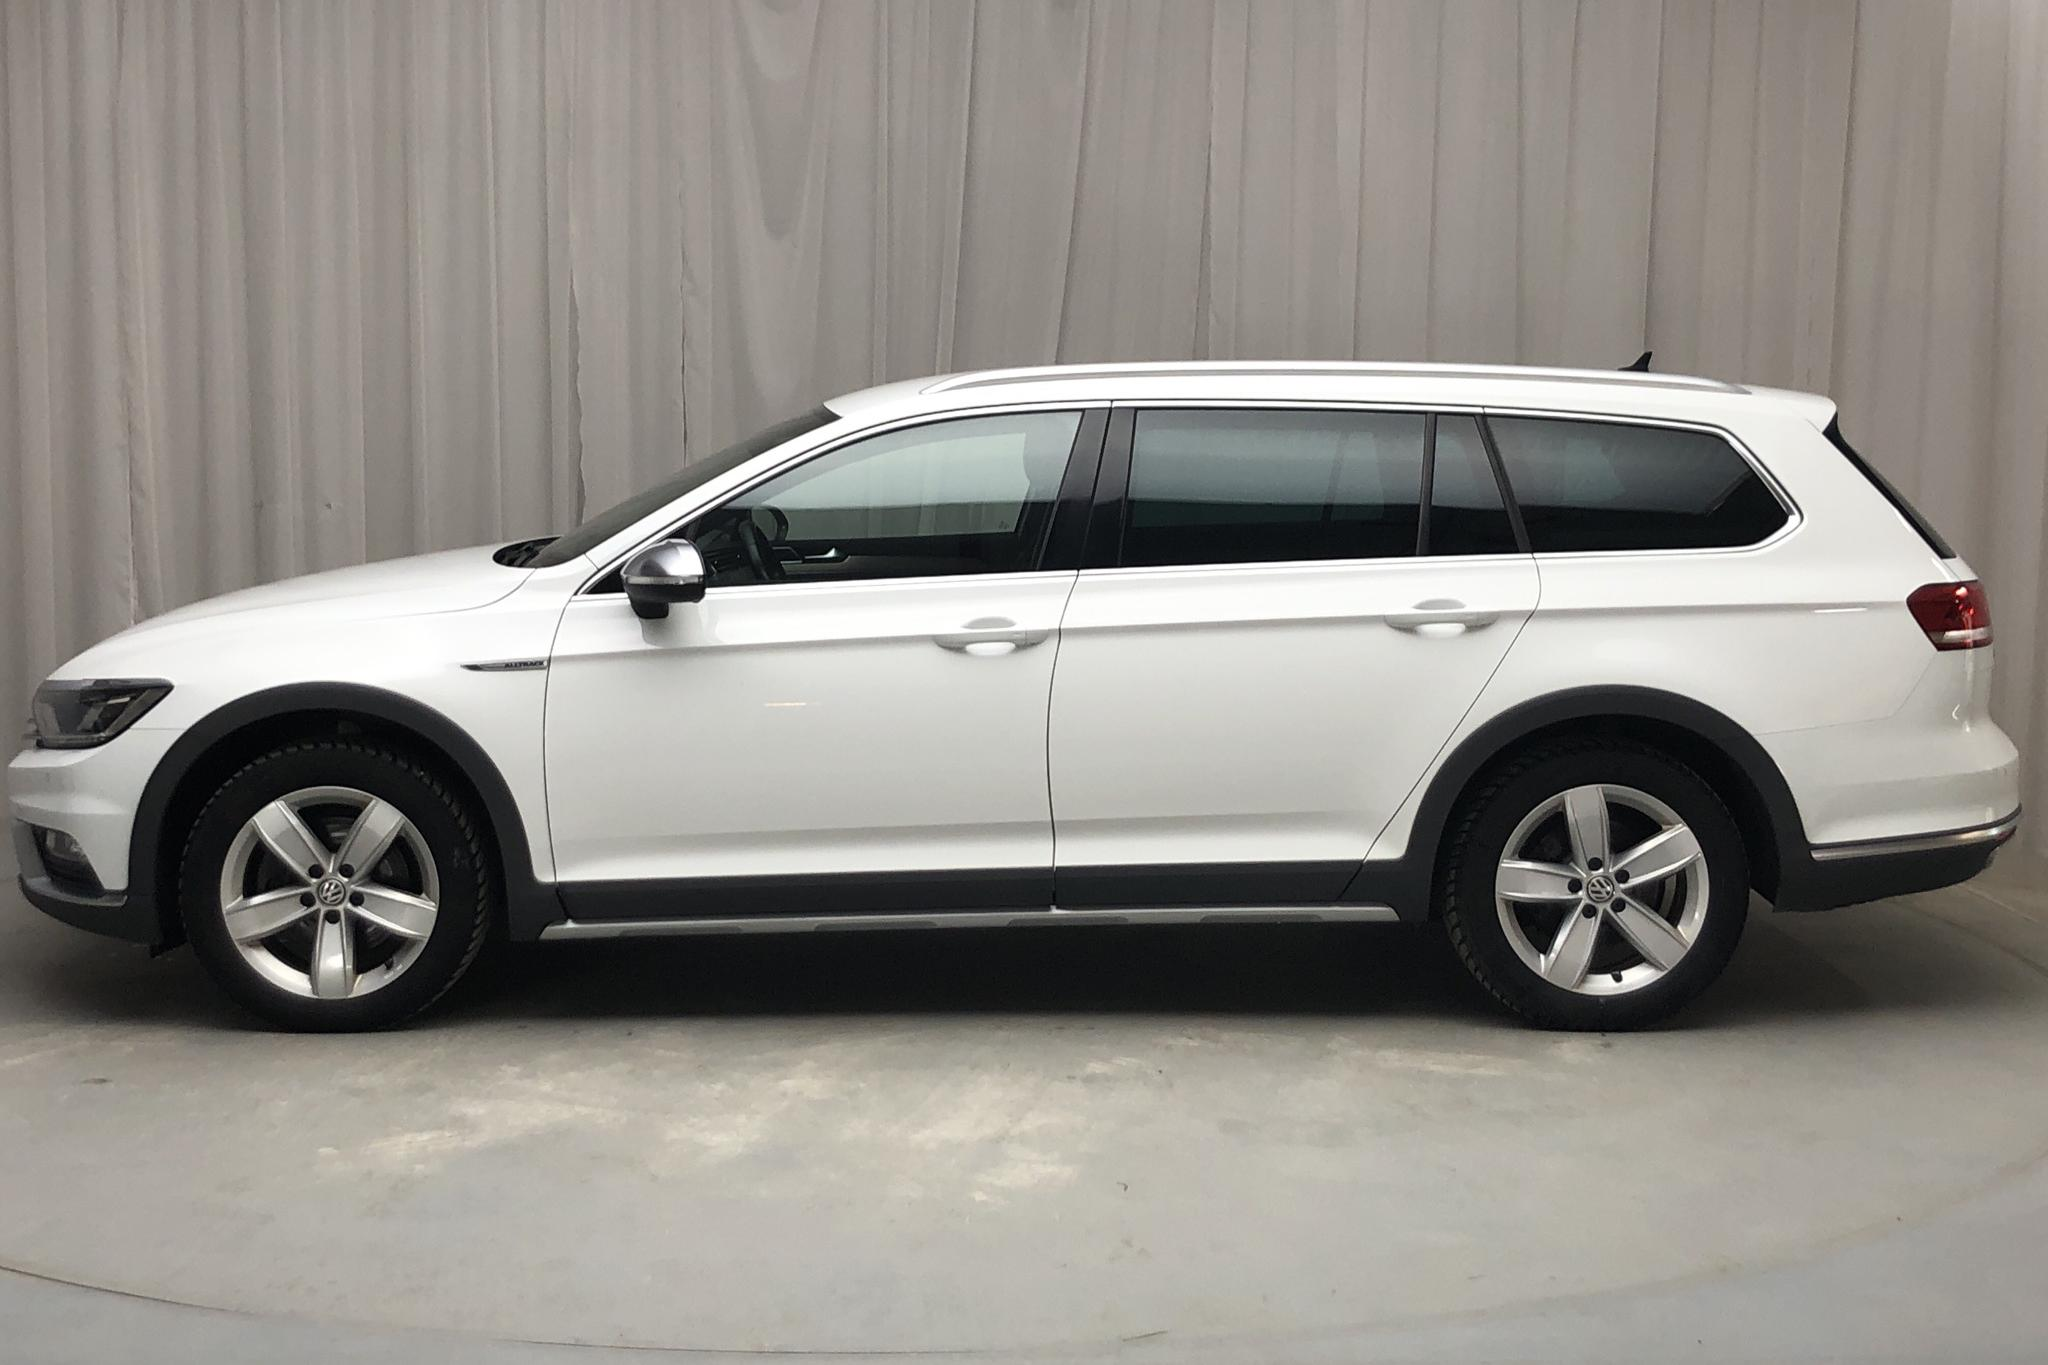 VW Passat Alltrack 2.0 TDI Sportscombi 4MOTION (190hk) - 152 000 km - Automatic - white - 2018